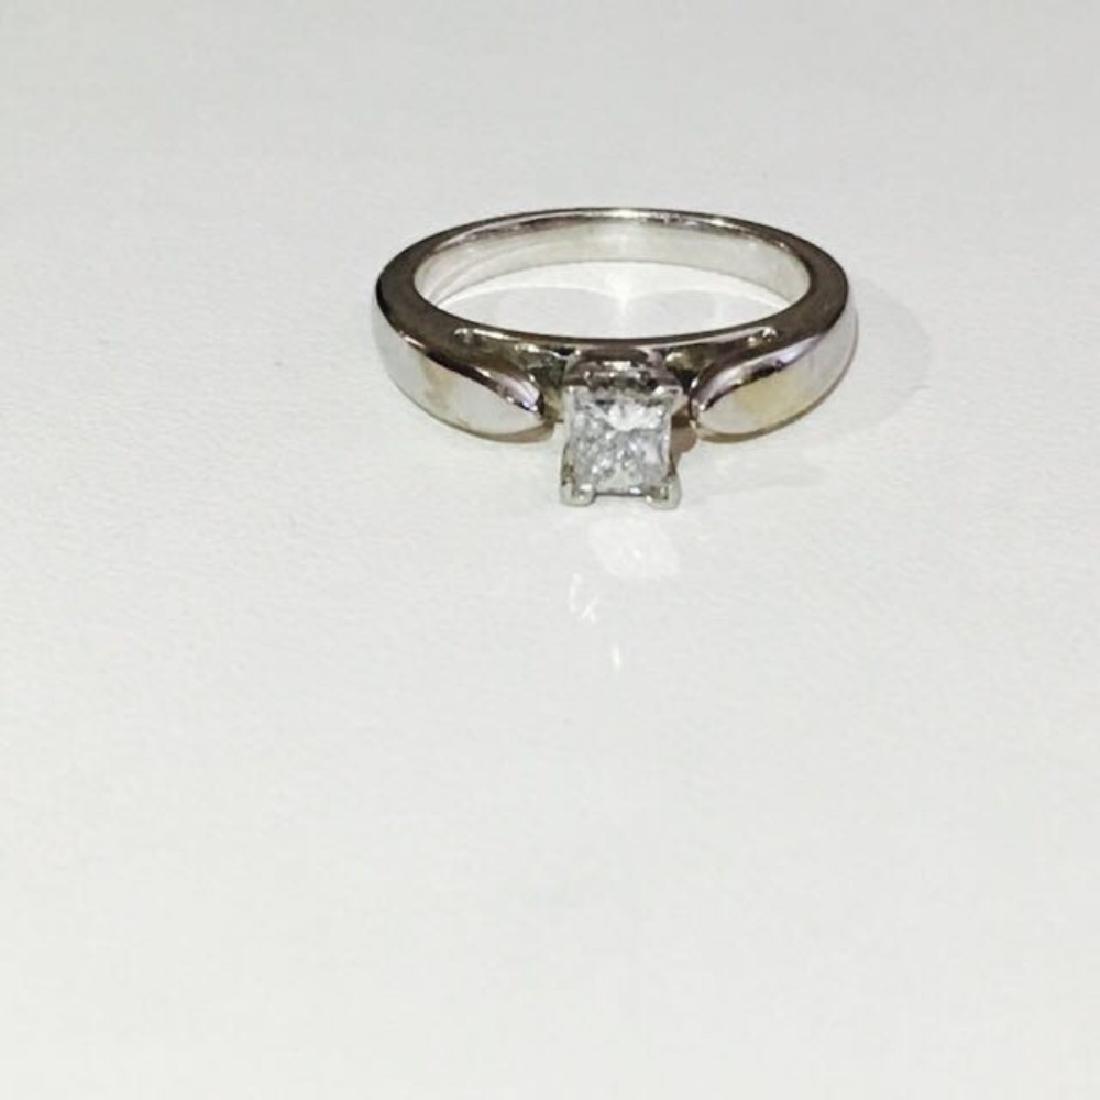 14k White Gold Princess Cut Diamond Engagement Ring - 2